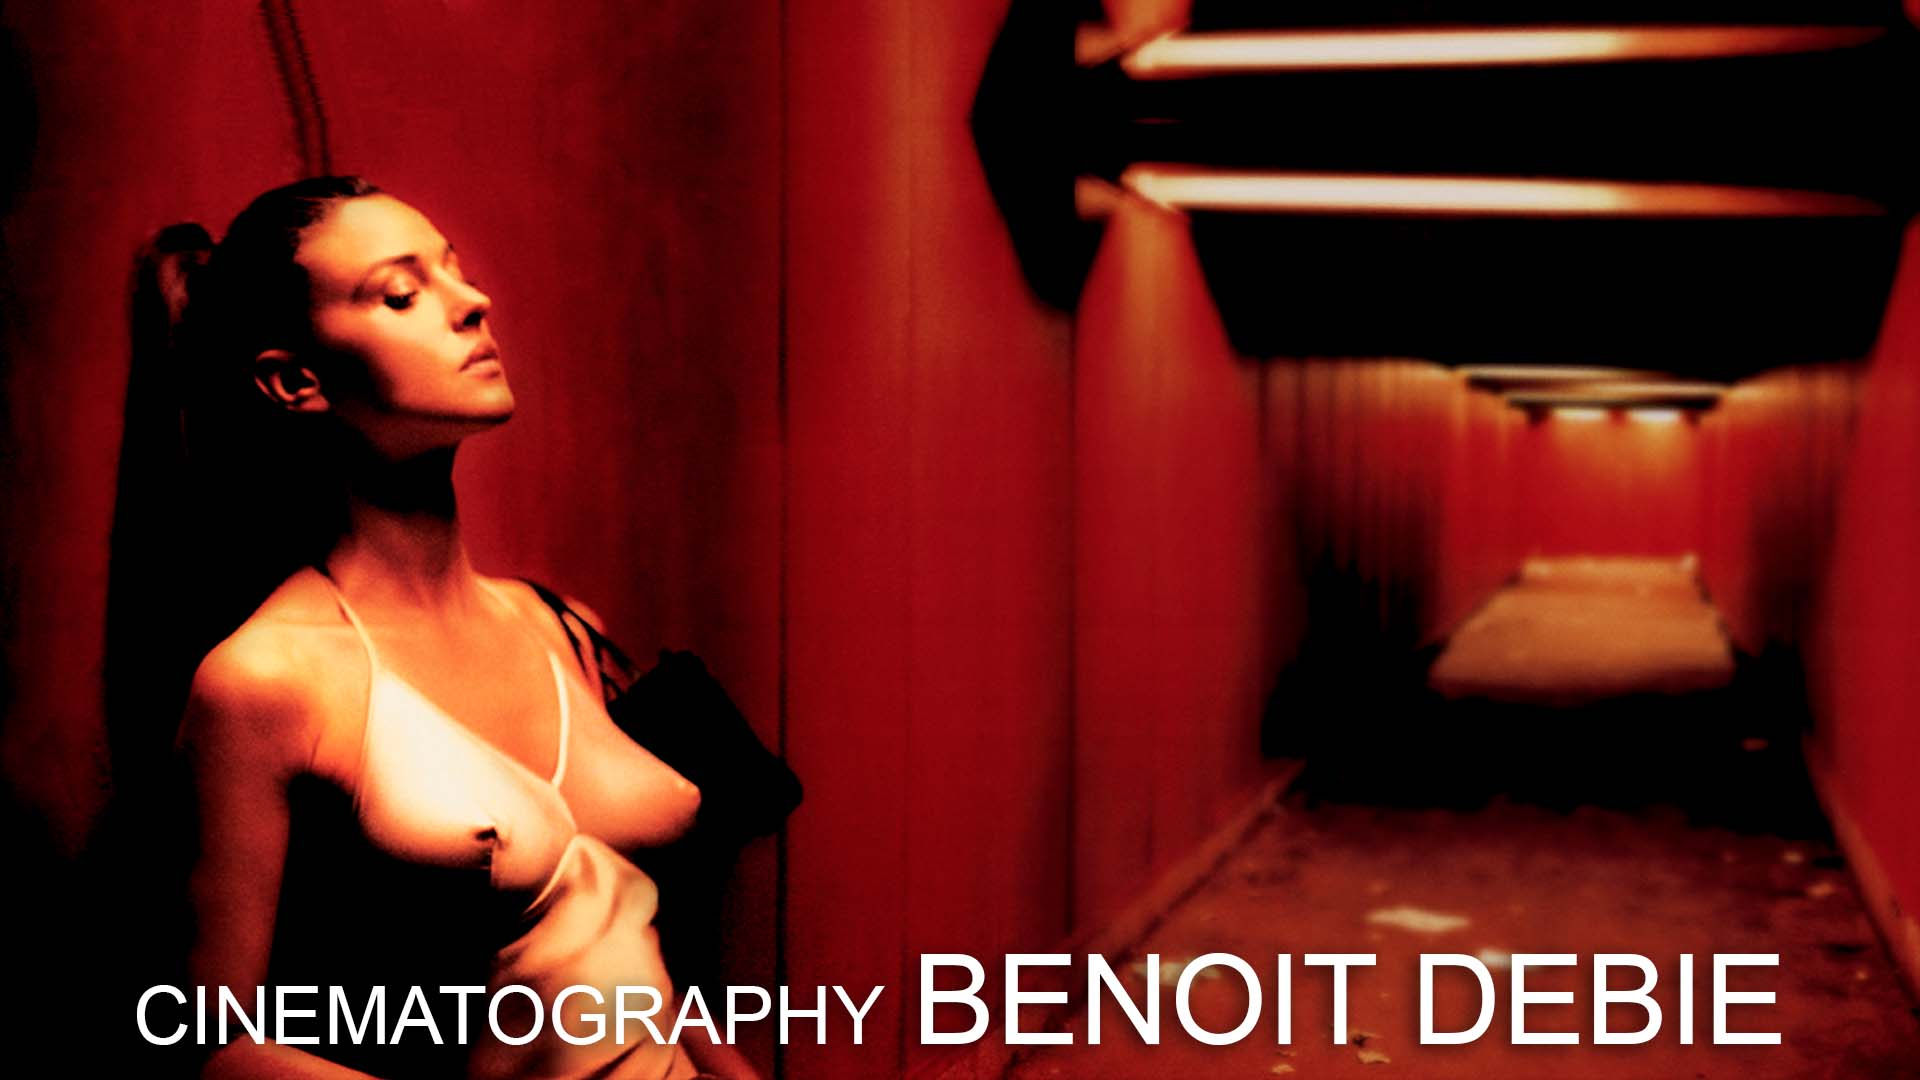 CinematographyBenoitDebieWC